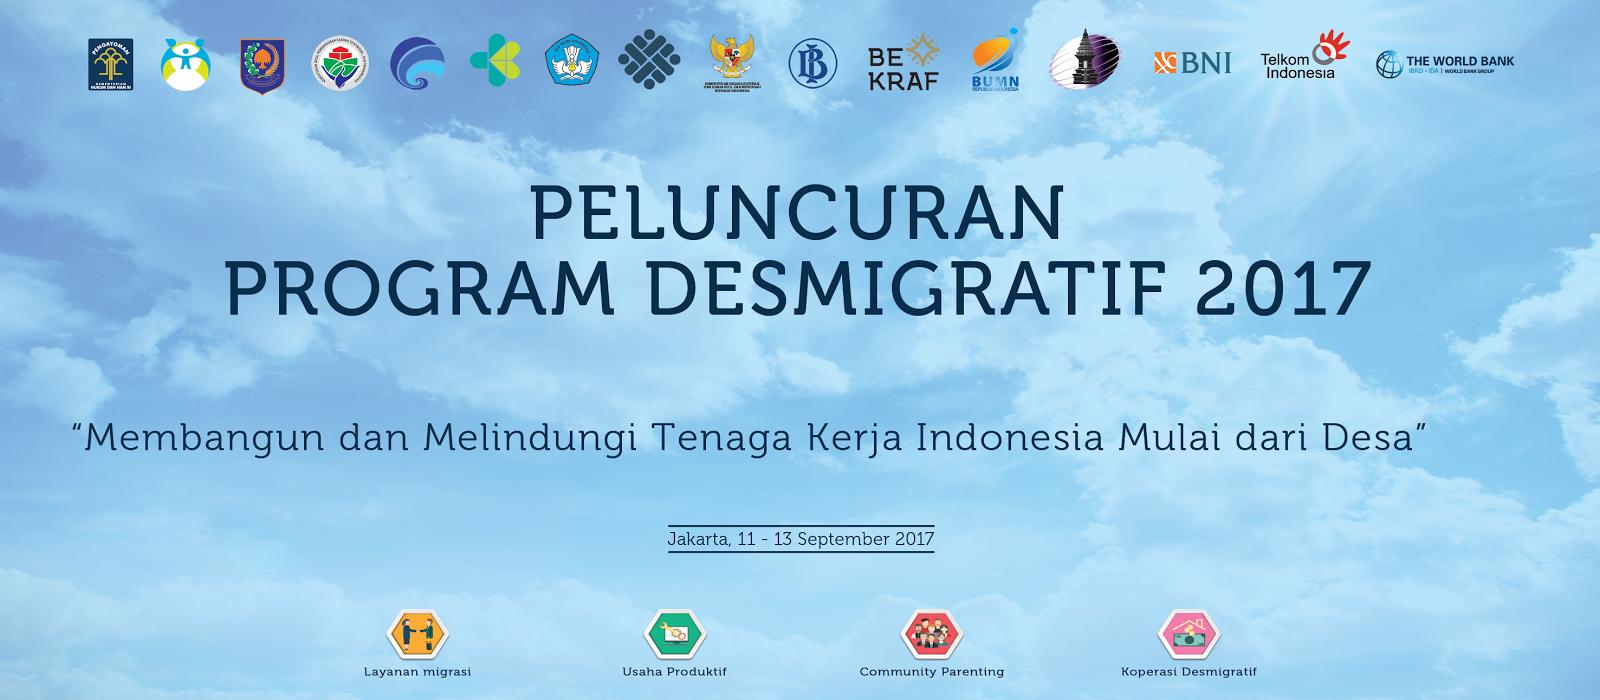 Peluncururan Program Desmigratif 2017